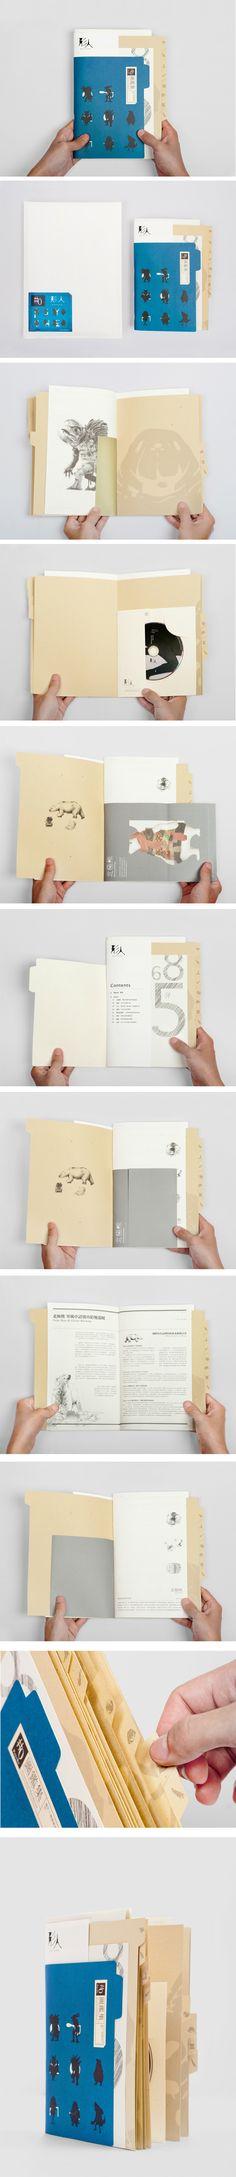 台湾书籍设计-Psyche Illustrated Handbook